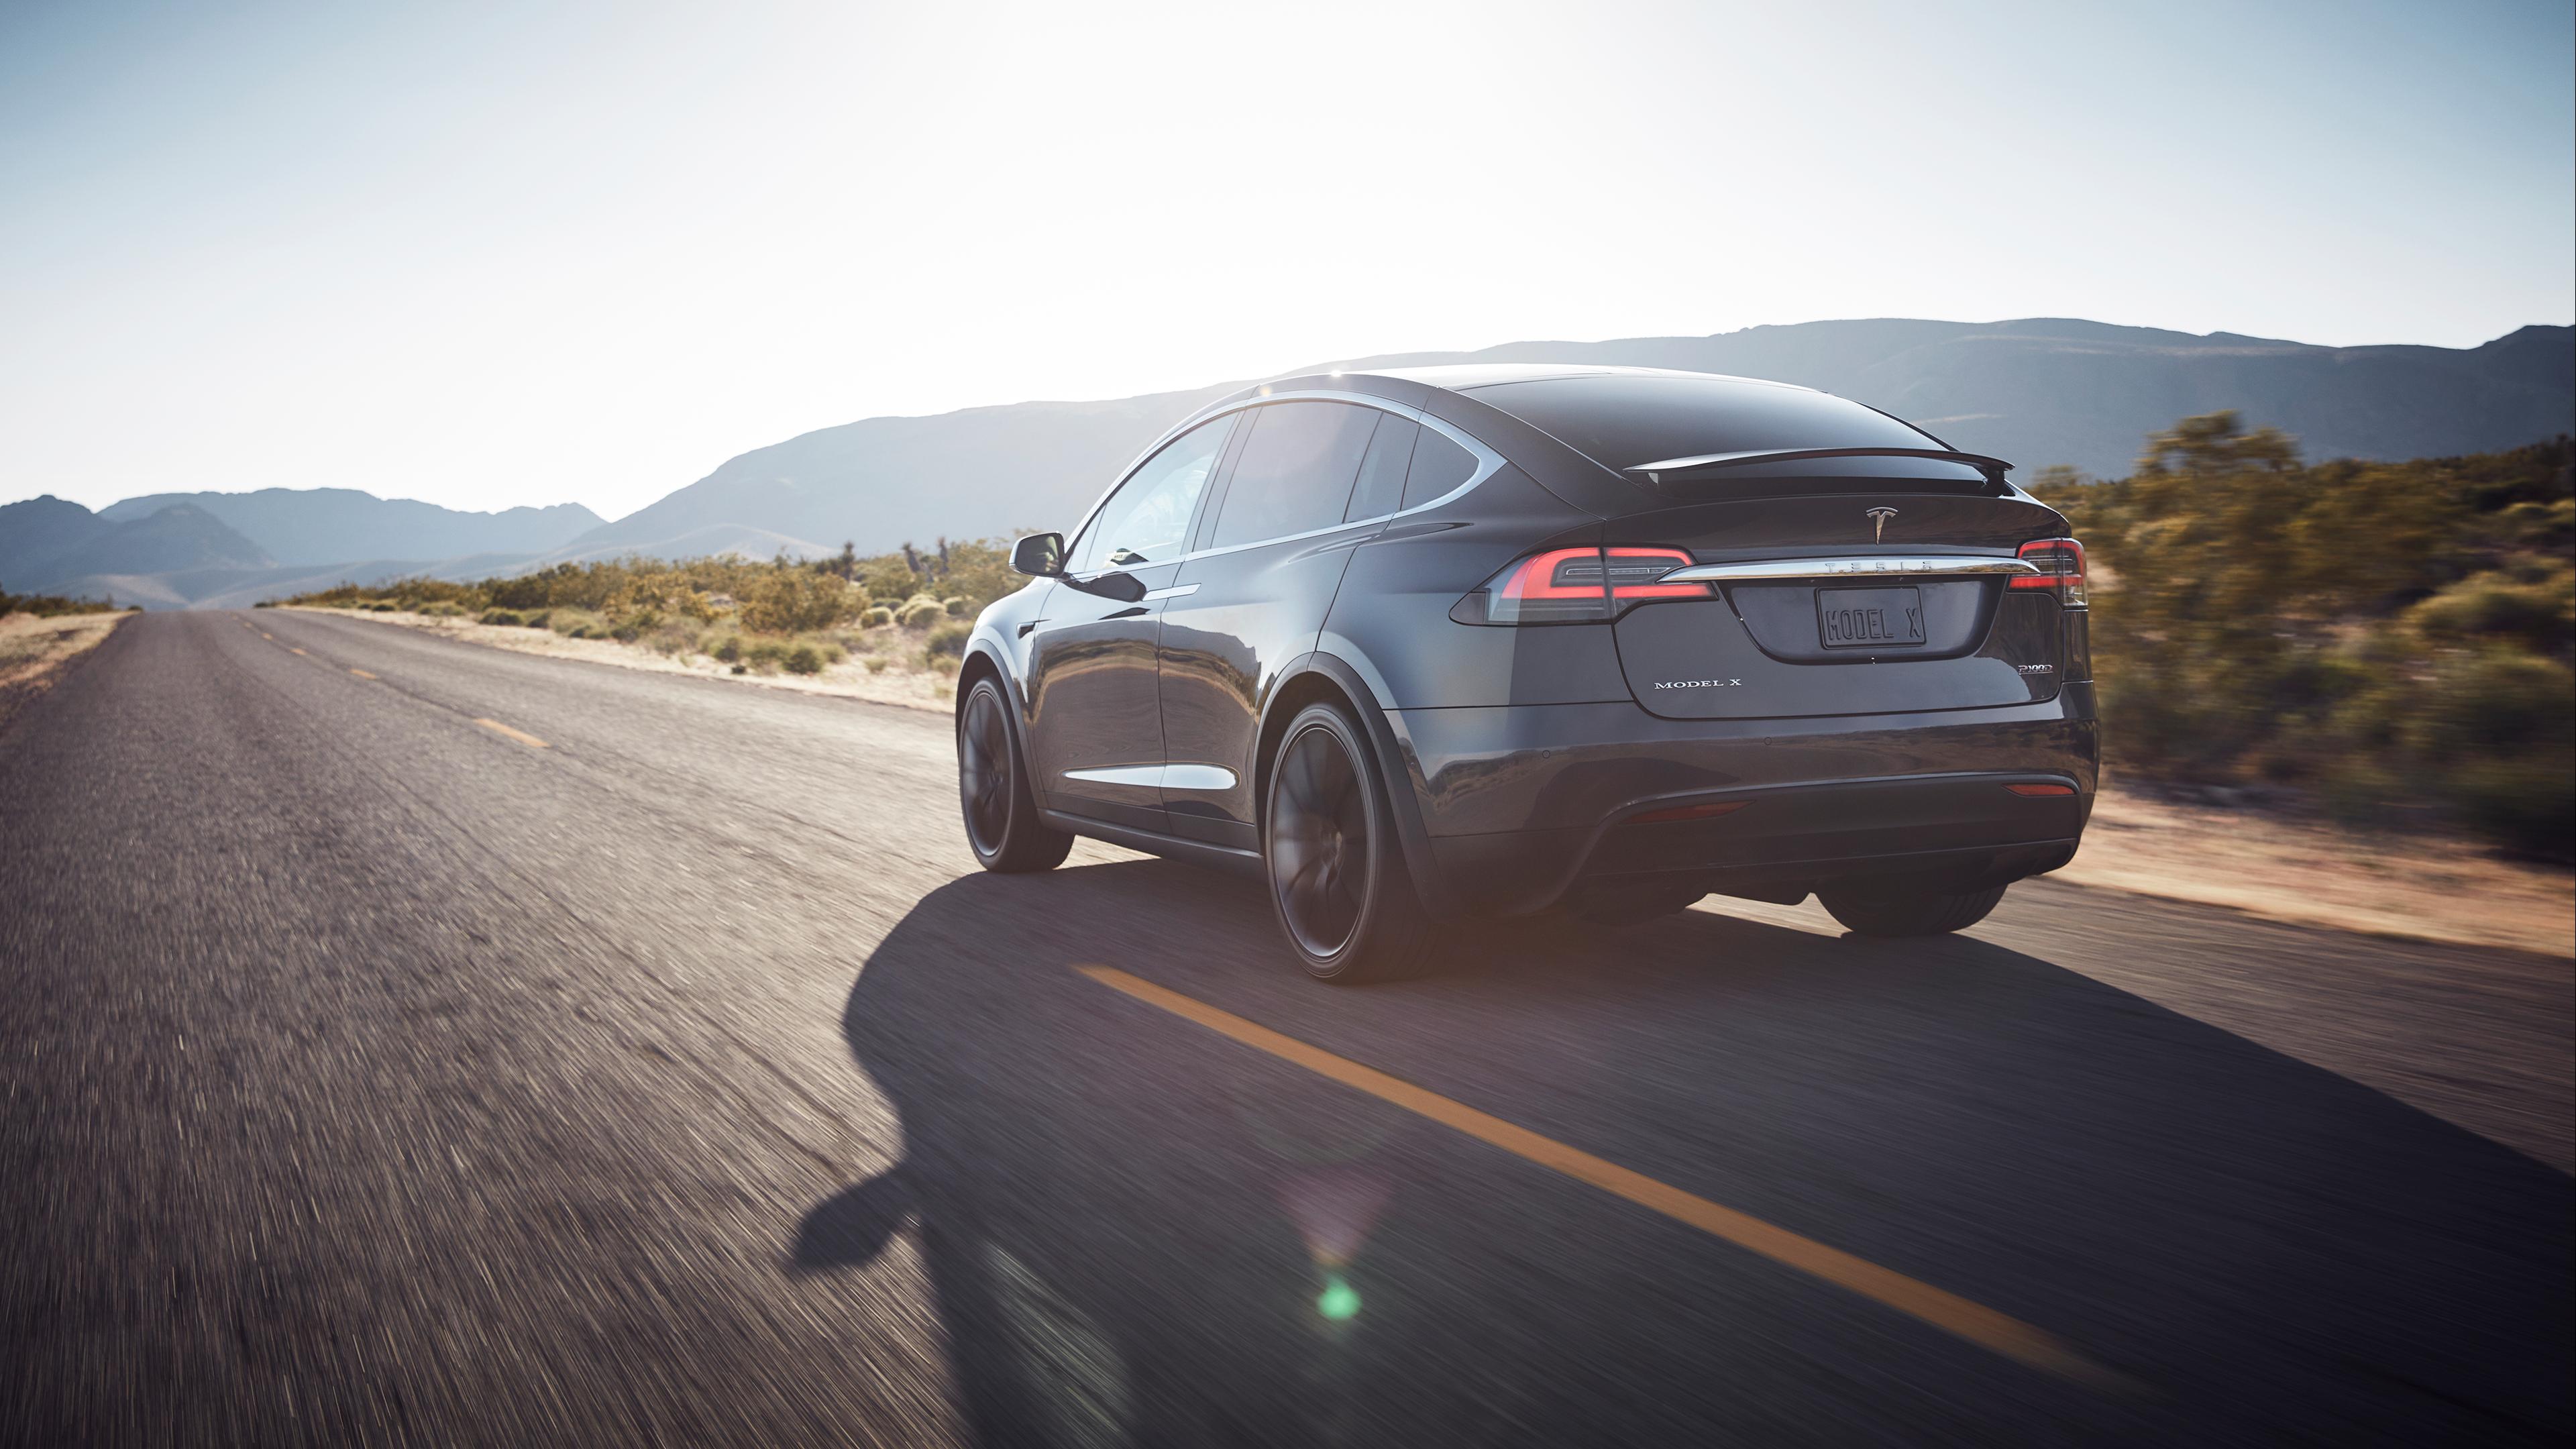 tesla-model-x-autopilot-full-self-driving